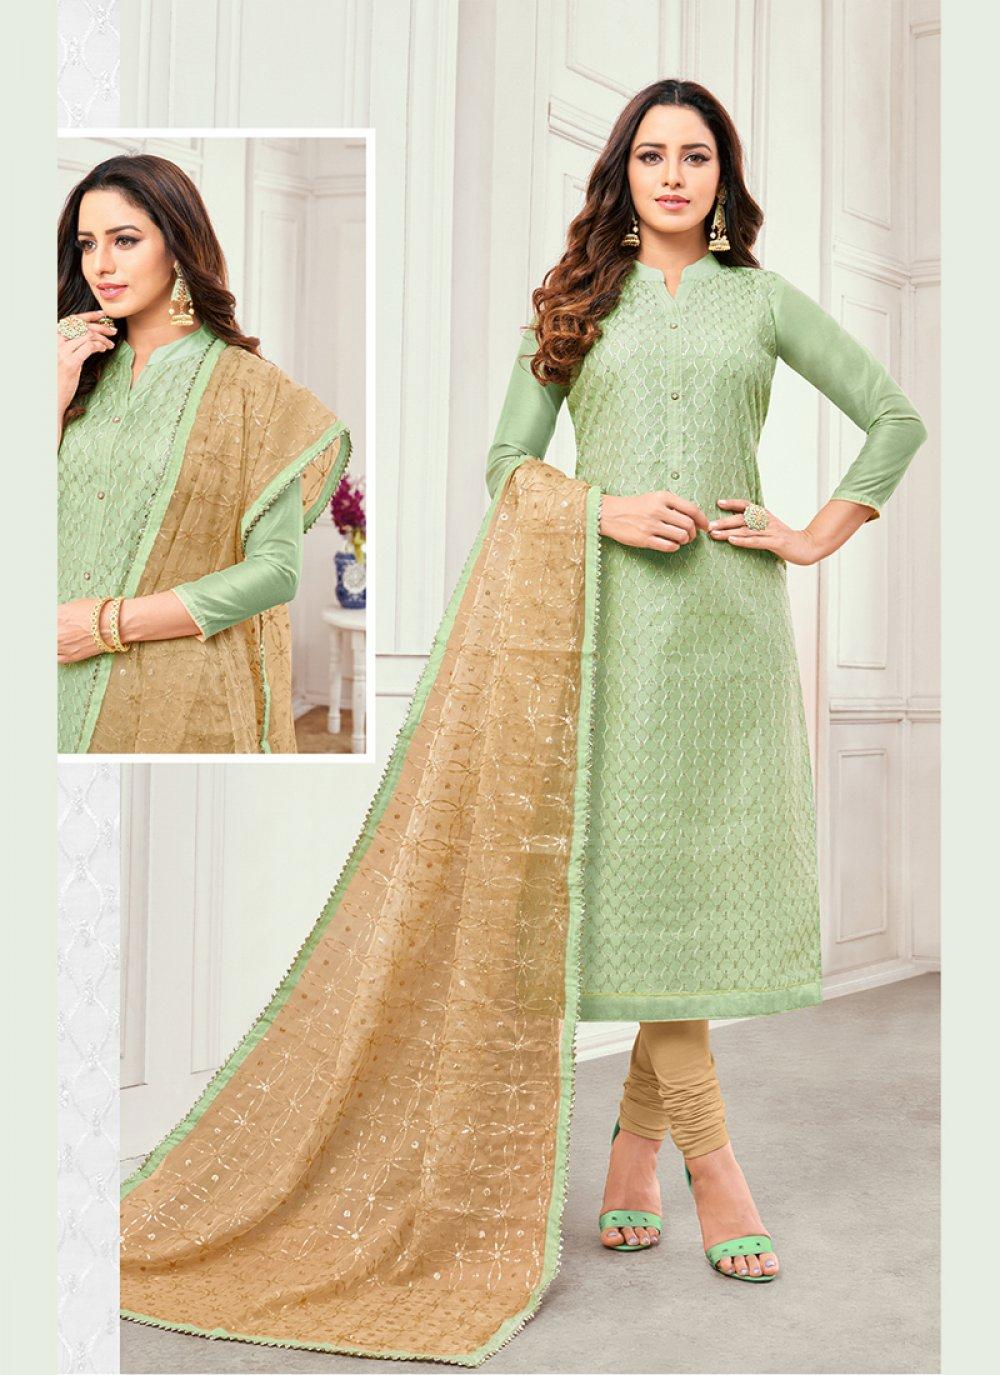 Green Embroidered Cotton Satin Salwar Kameez